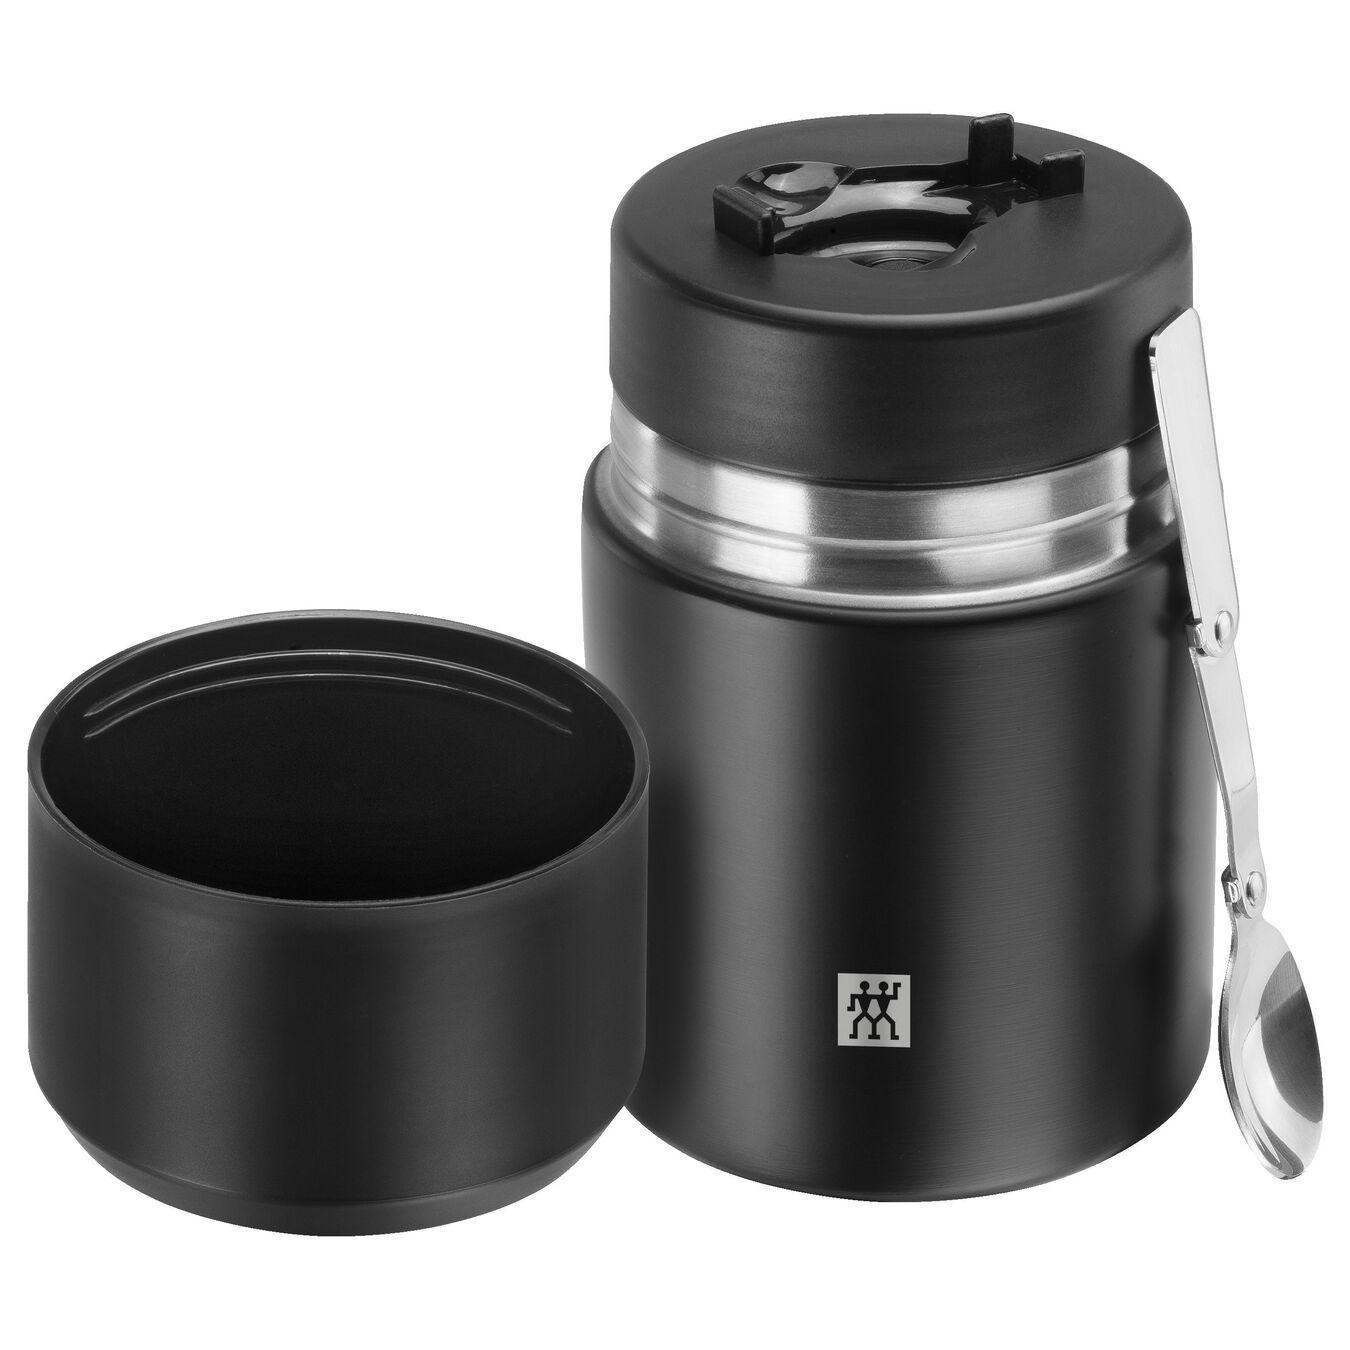 Contenant alimentaire isotherme, Noir | Acier inoxydable | 700 ml,,large 3